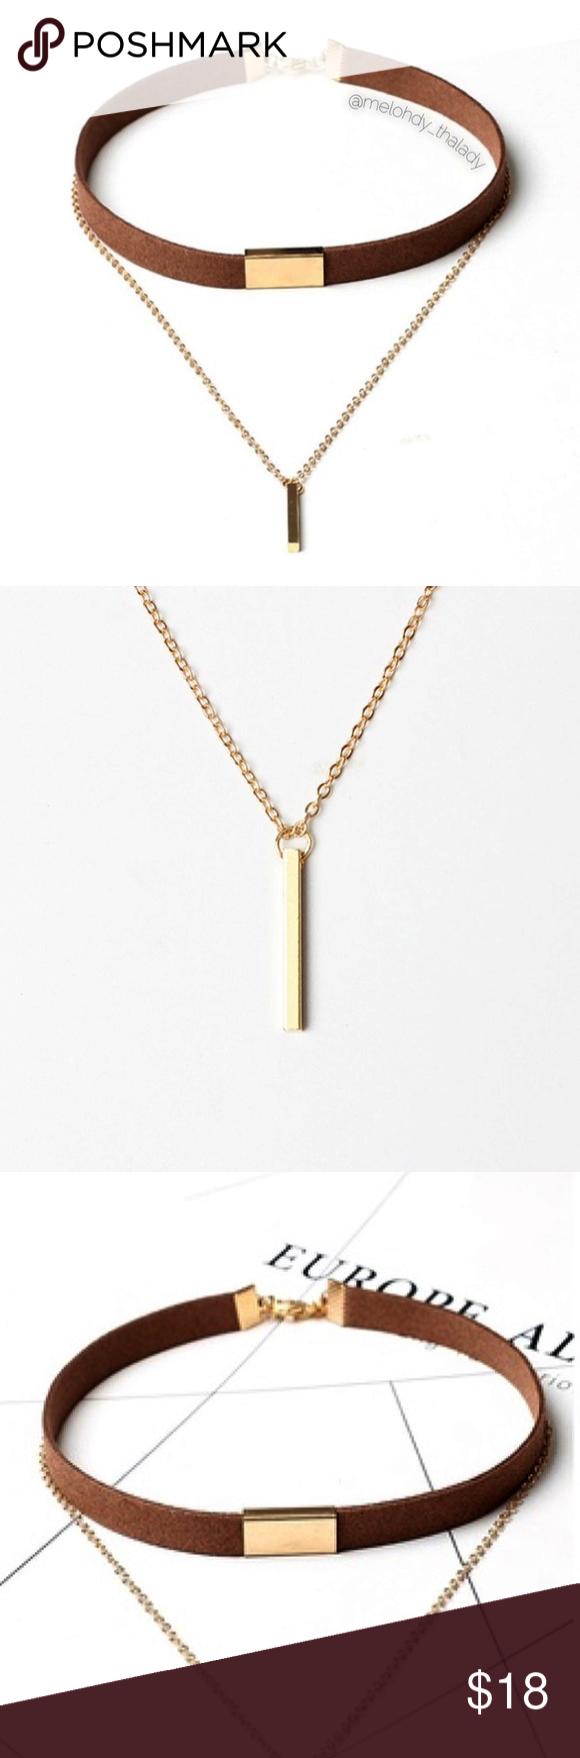 Gold necklaces modern gold necklace set design gold necklaces